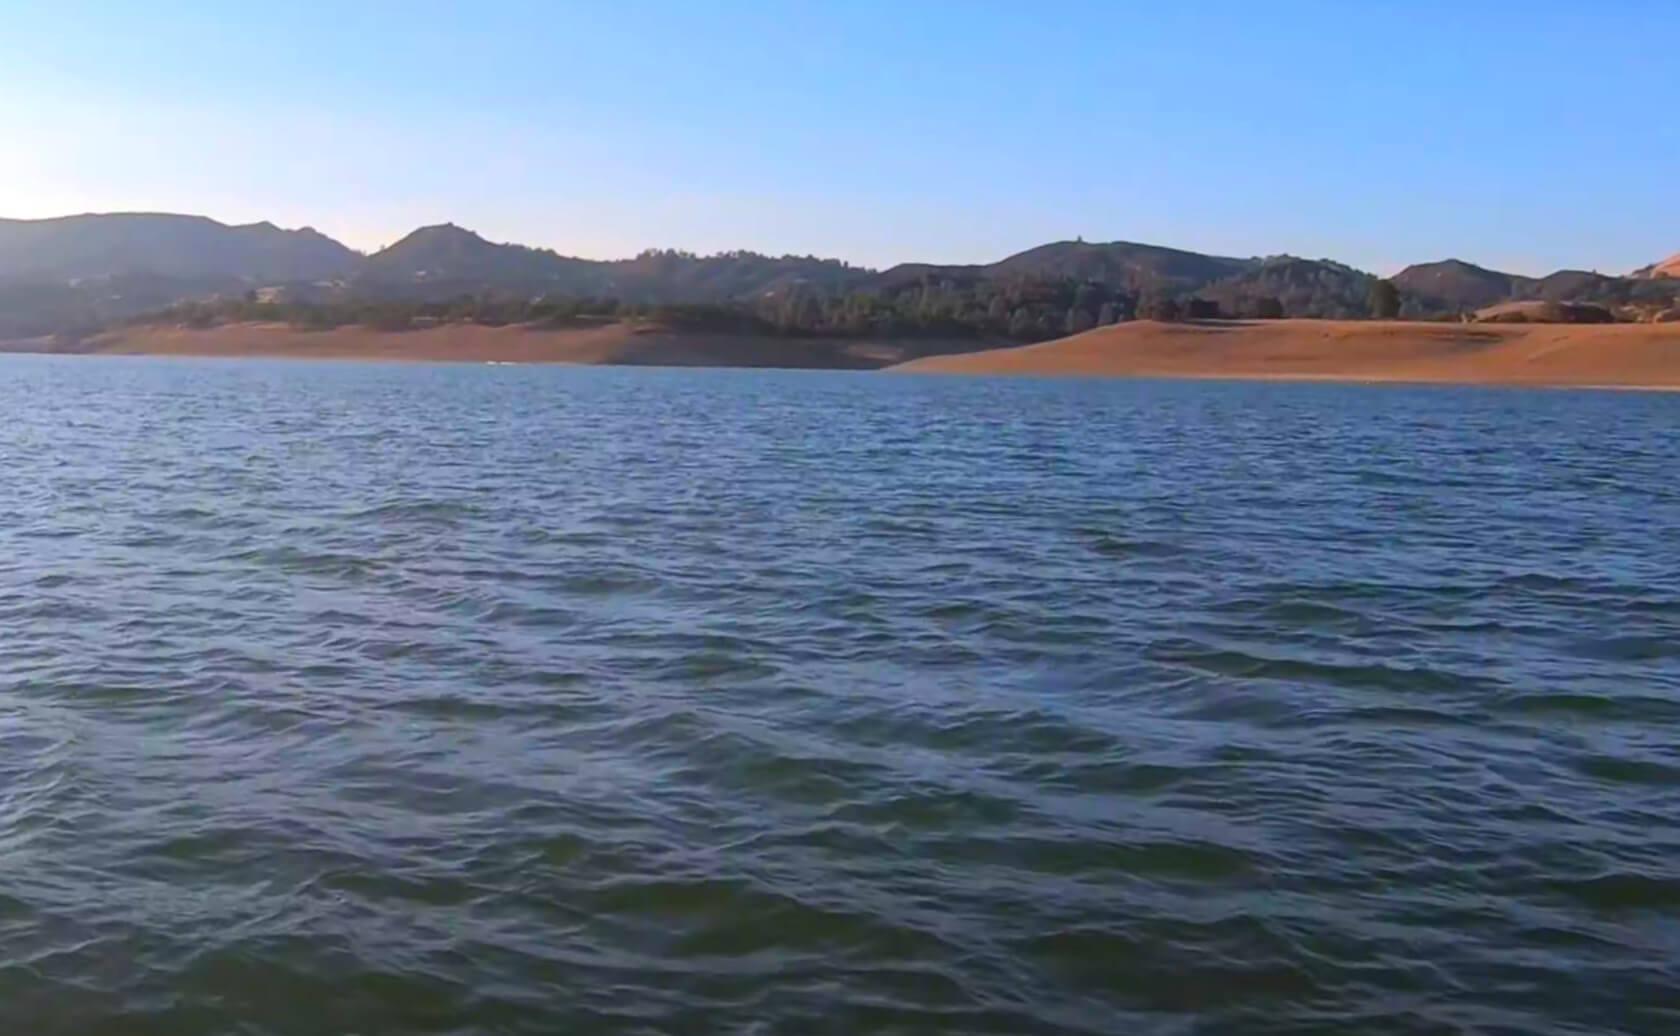 Nacimiento-Lake-Fishing-Guide-Report-California-04